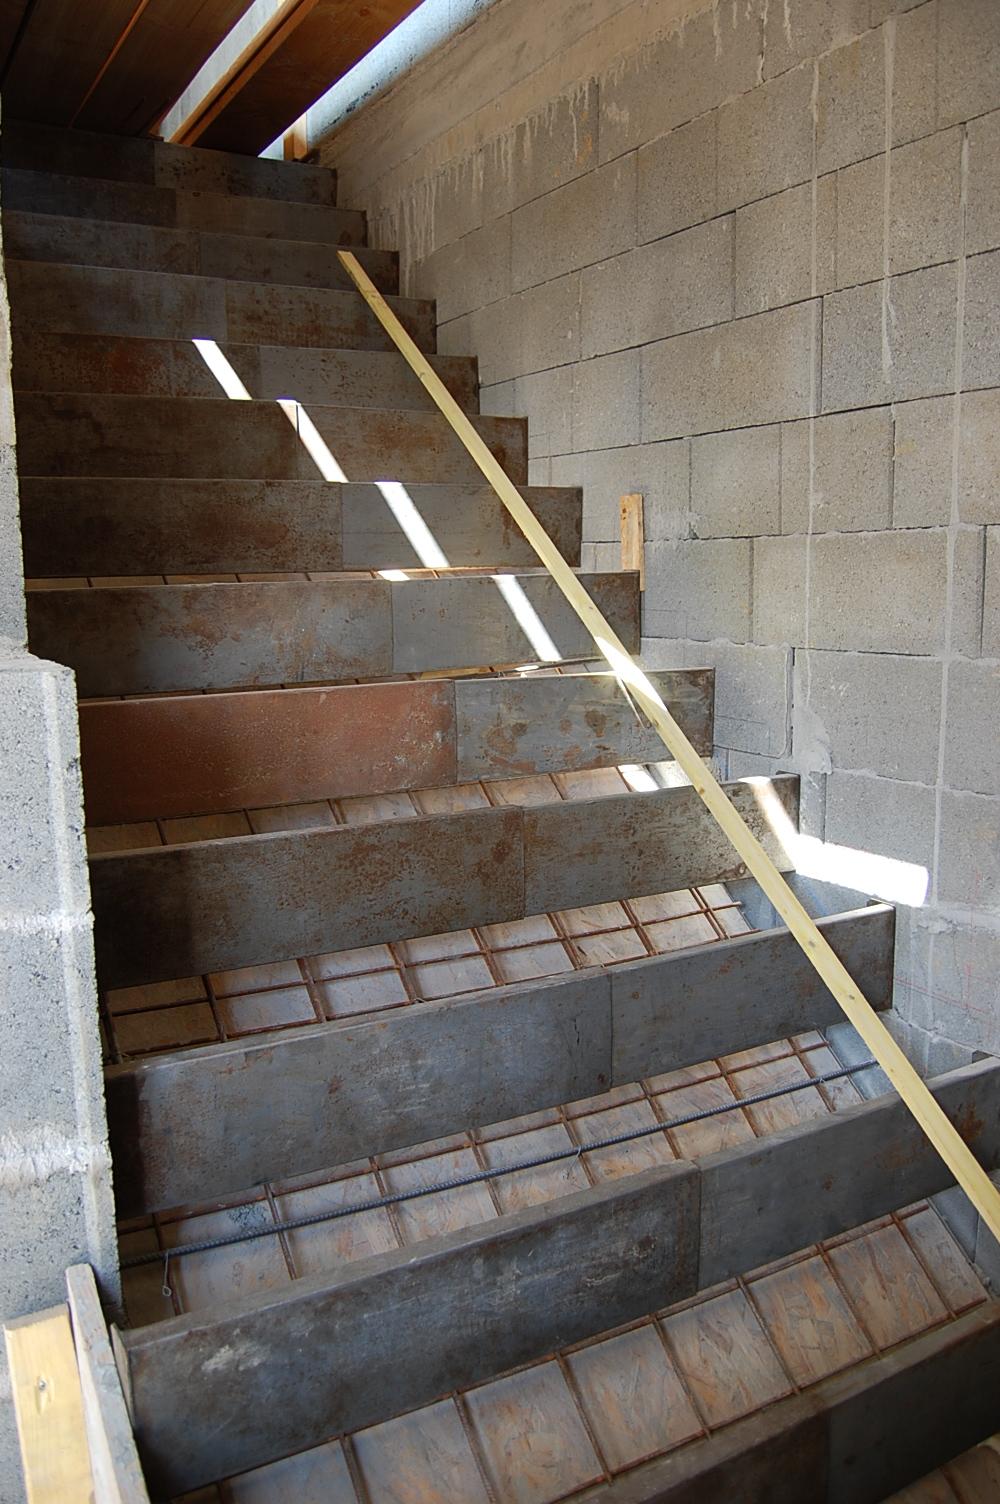 Pin coffrage escalier on pinterest - Coffrage escalier arrondi ...